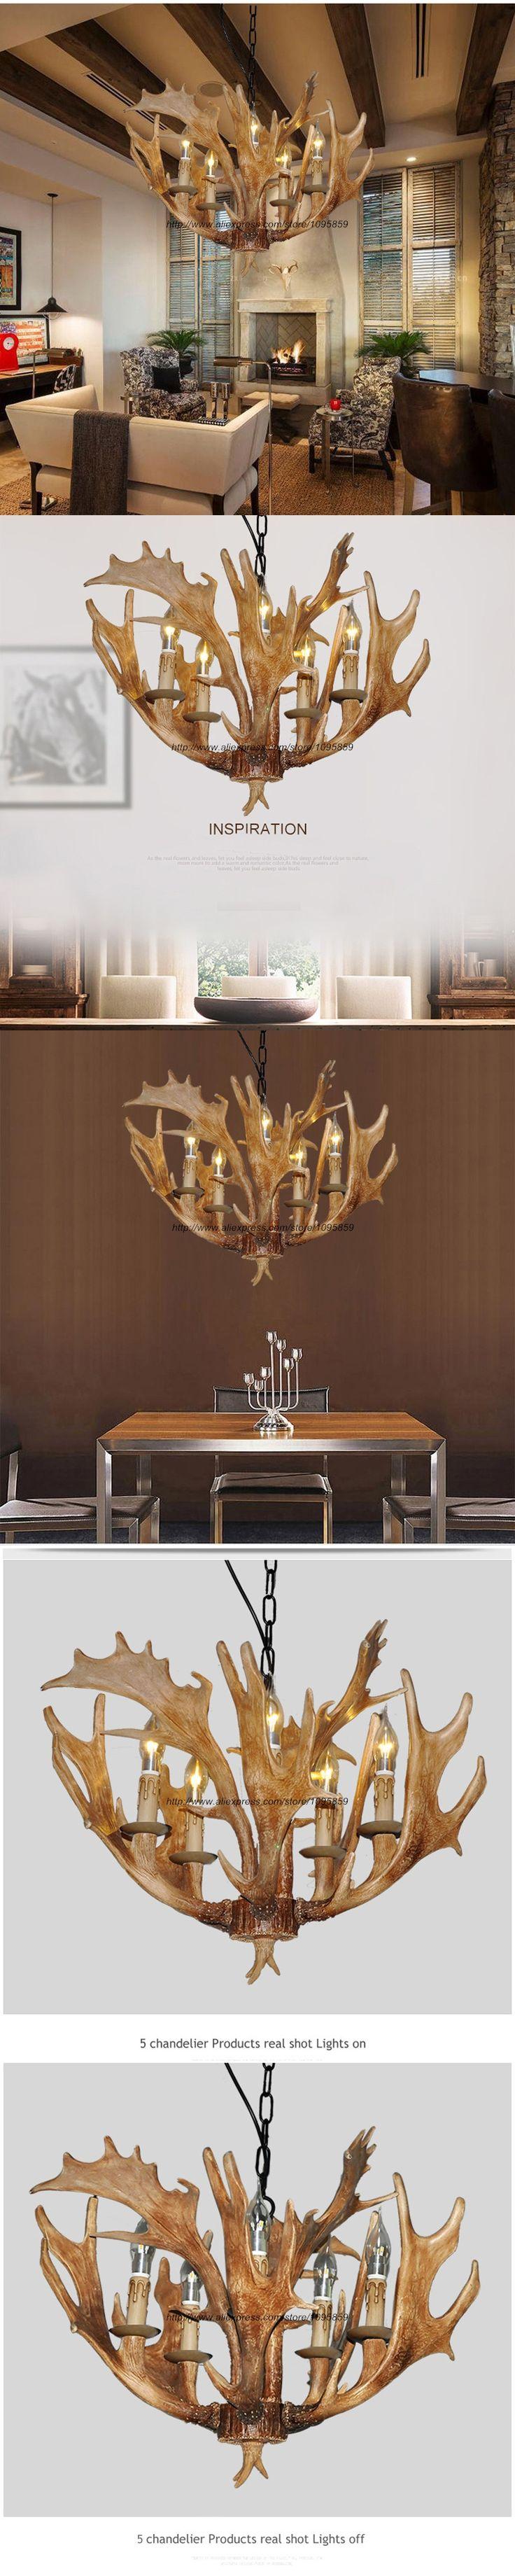 Best 25 Antler chandelier ideas on Pinterest